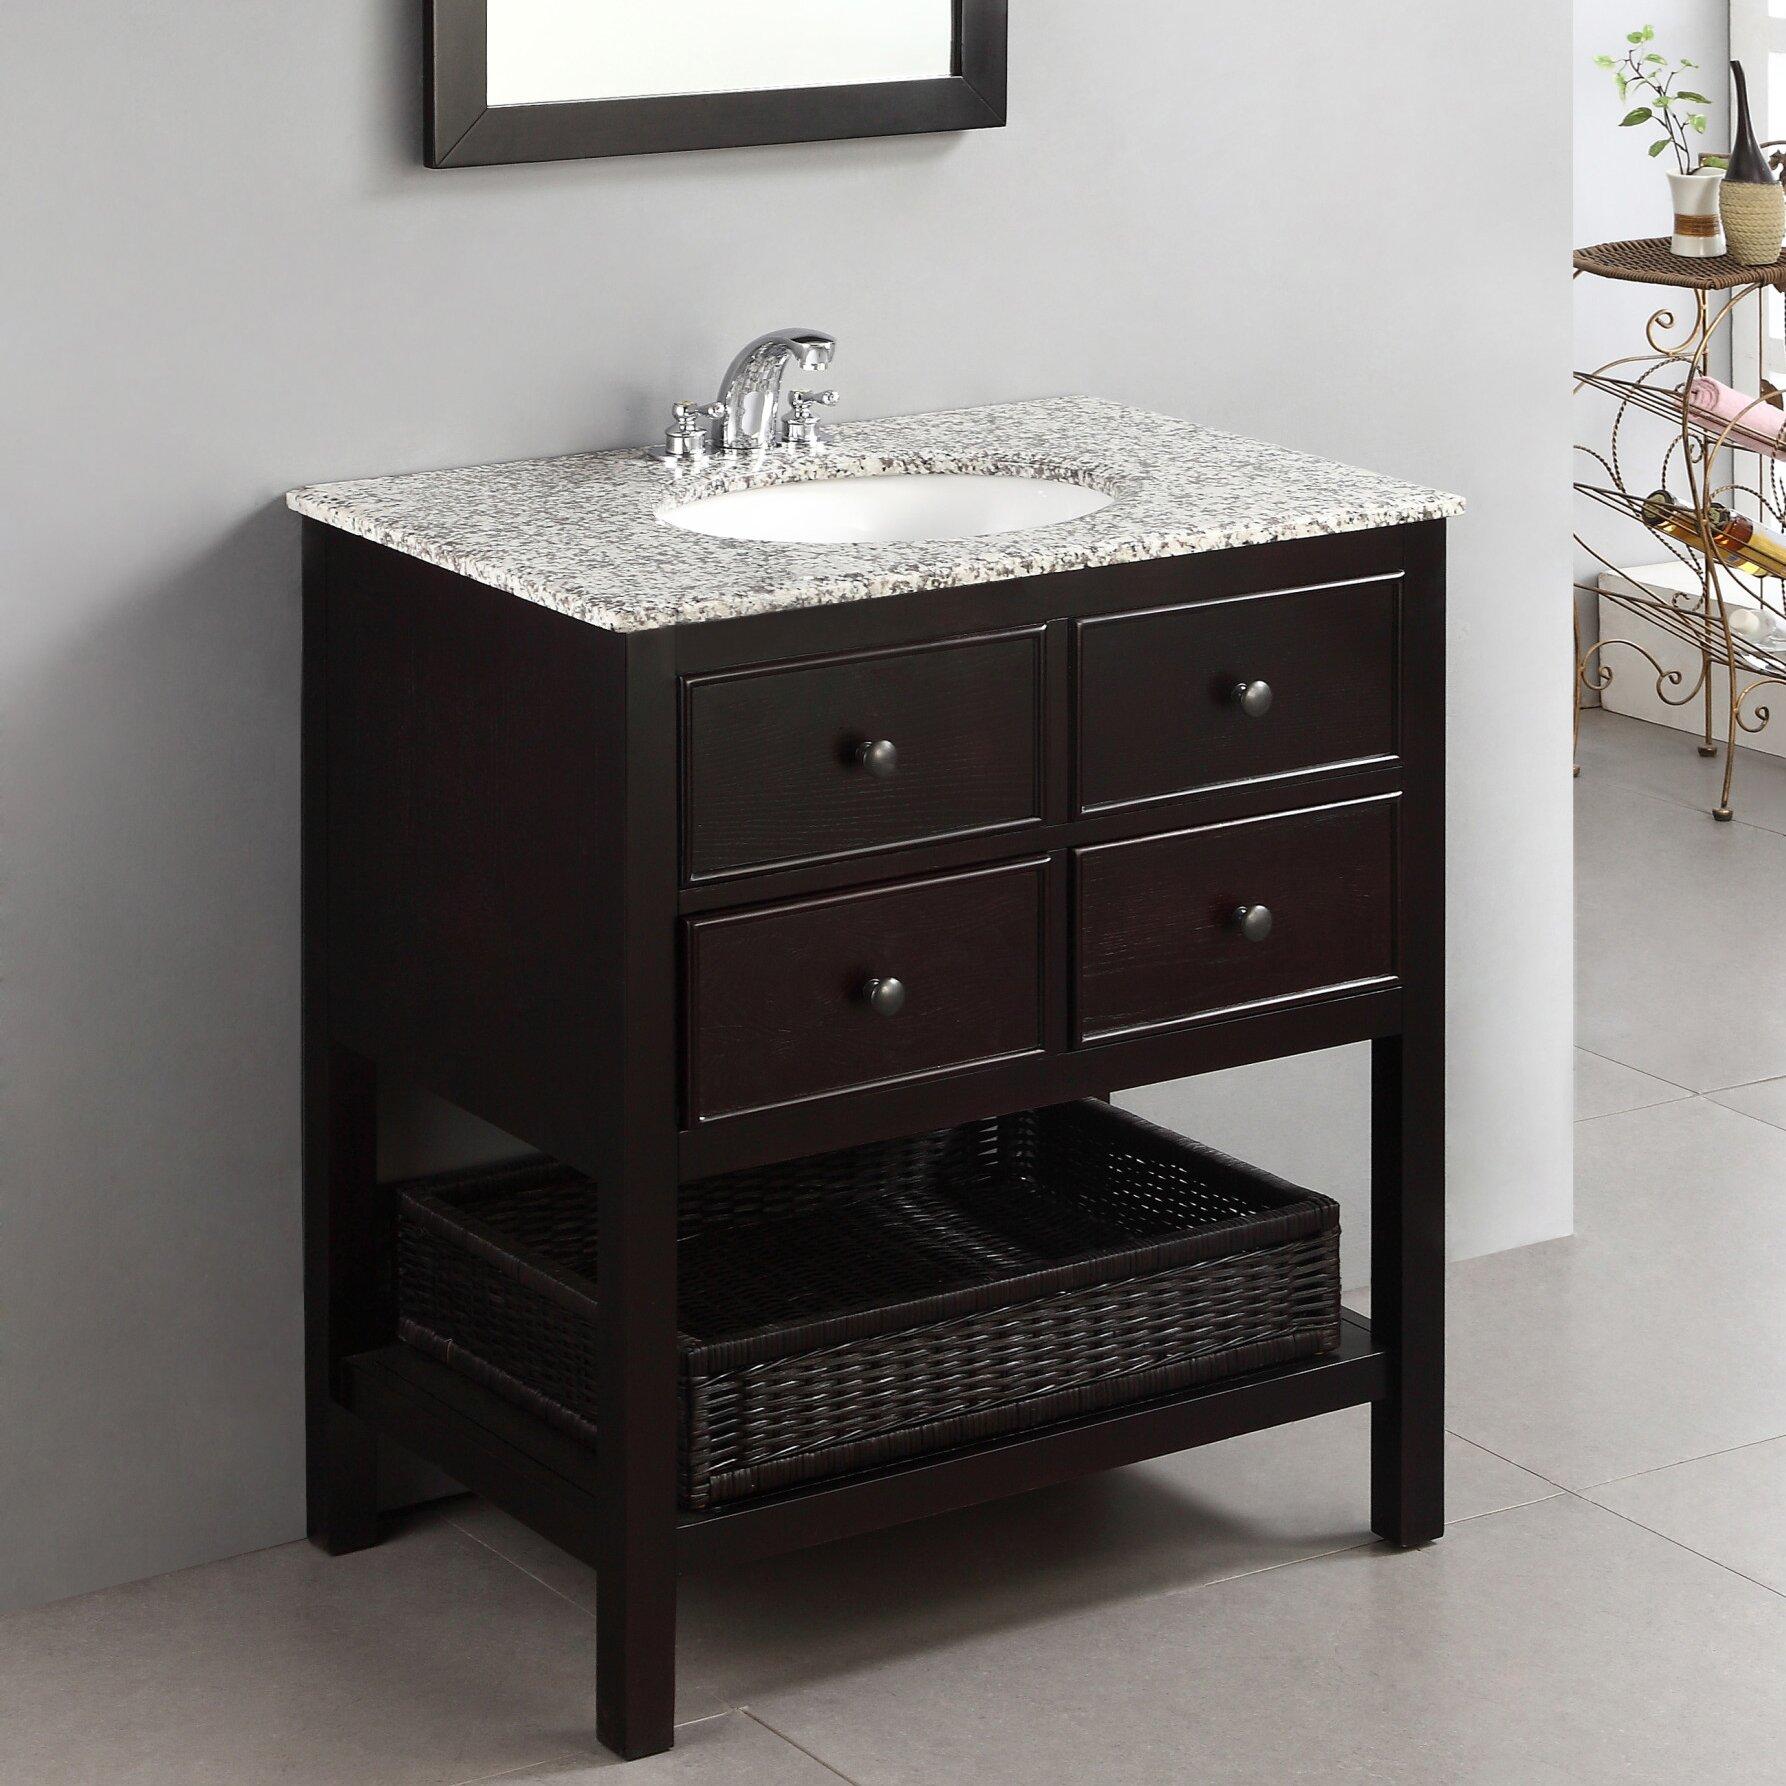 "Alcott Hill Gettysburg 30"" Single Bathroom Vanity Set"